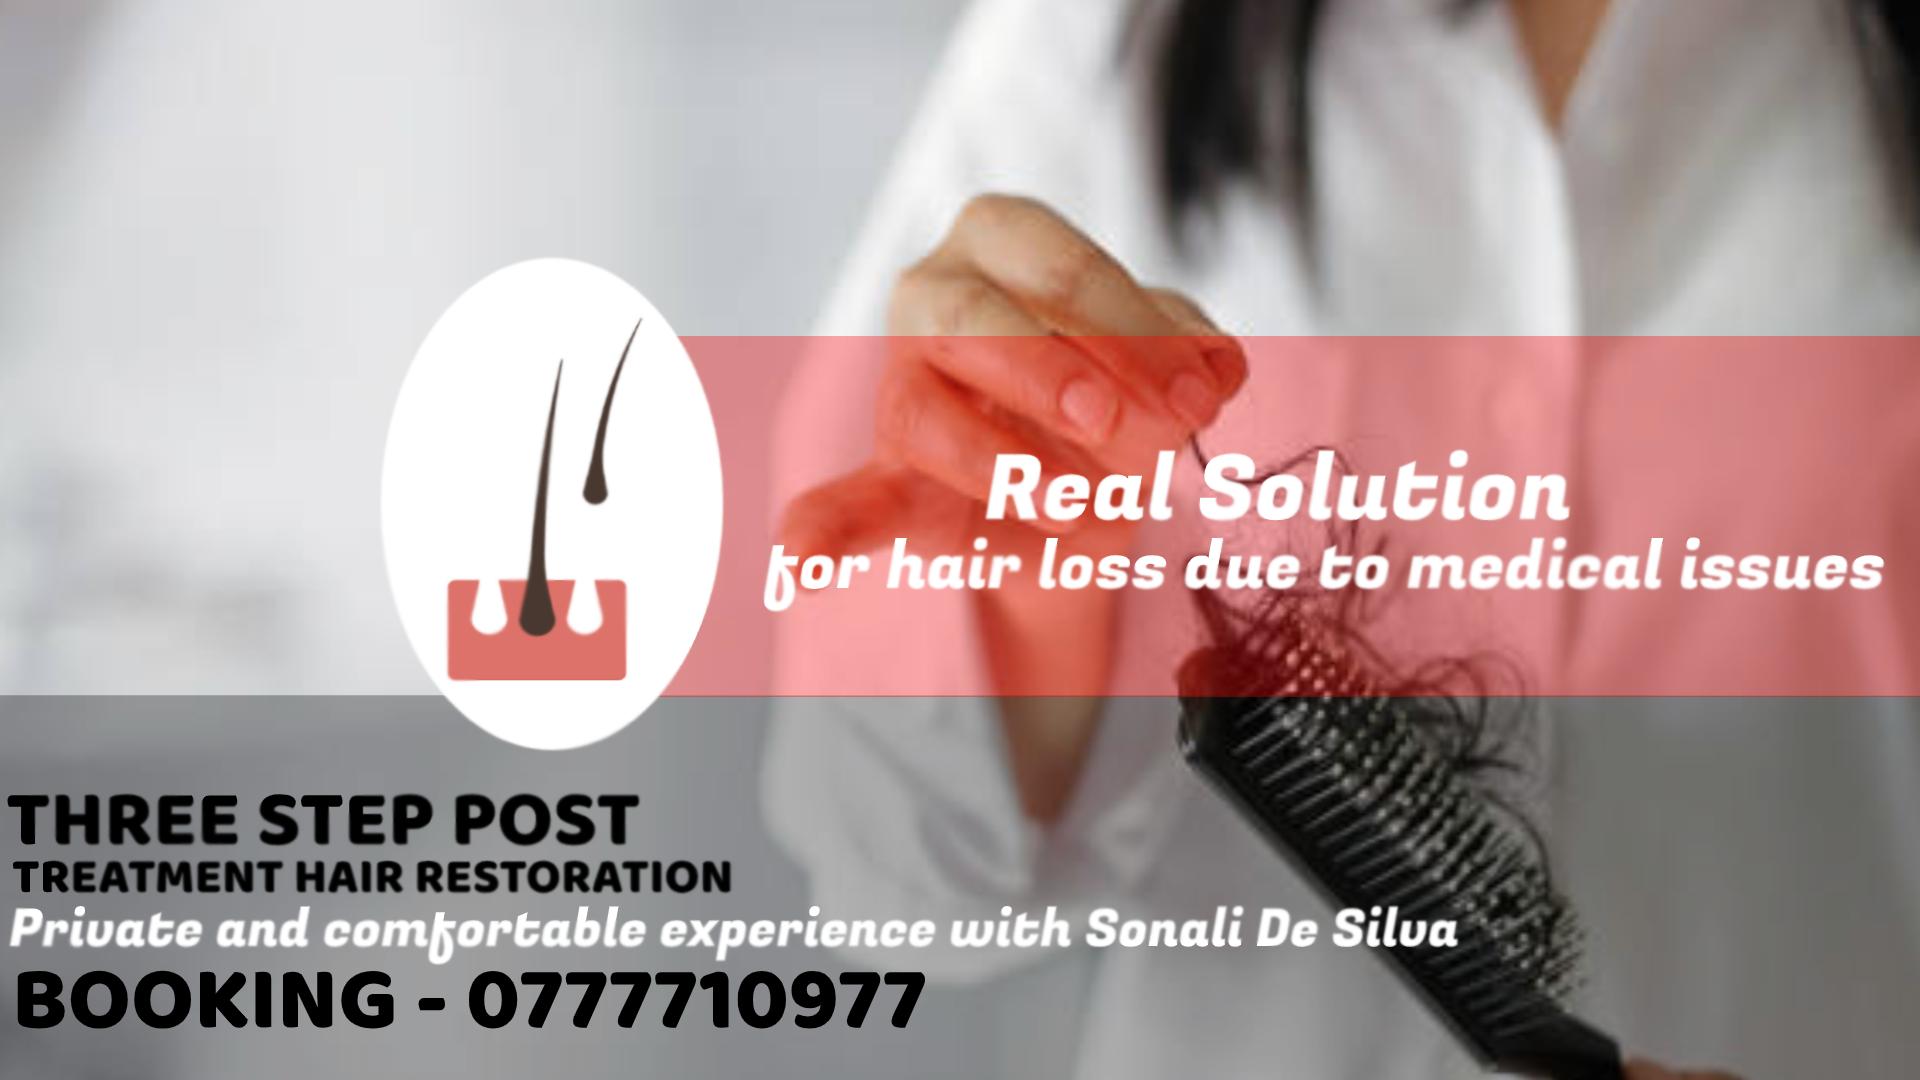 THREE STEP POST TREATMENT HAIR RESTORATION